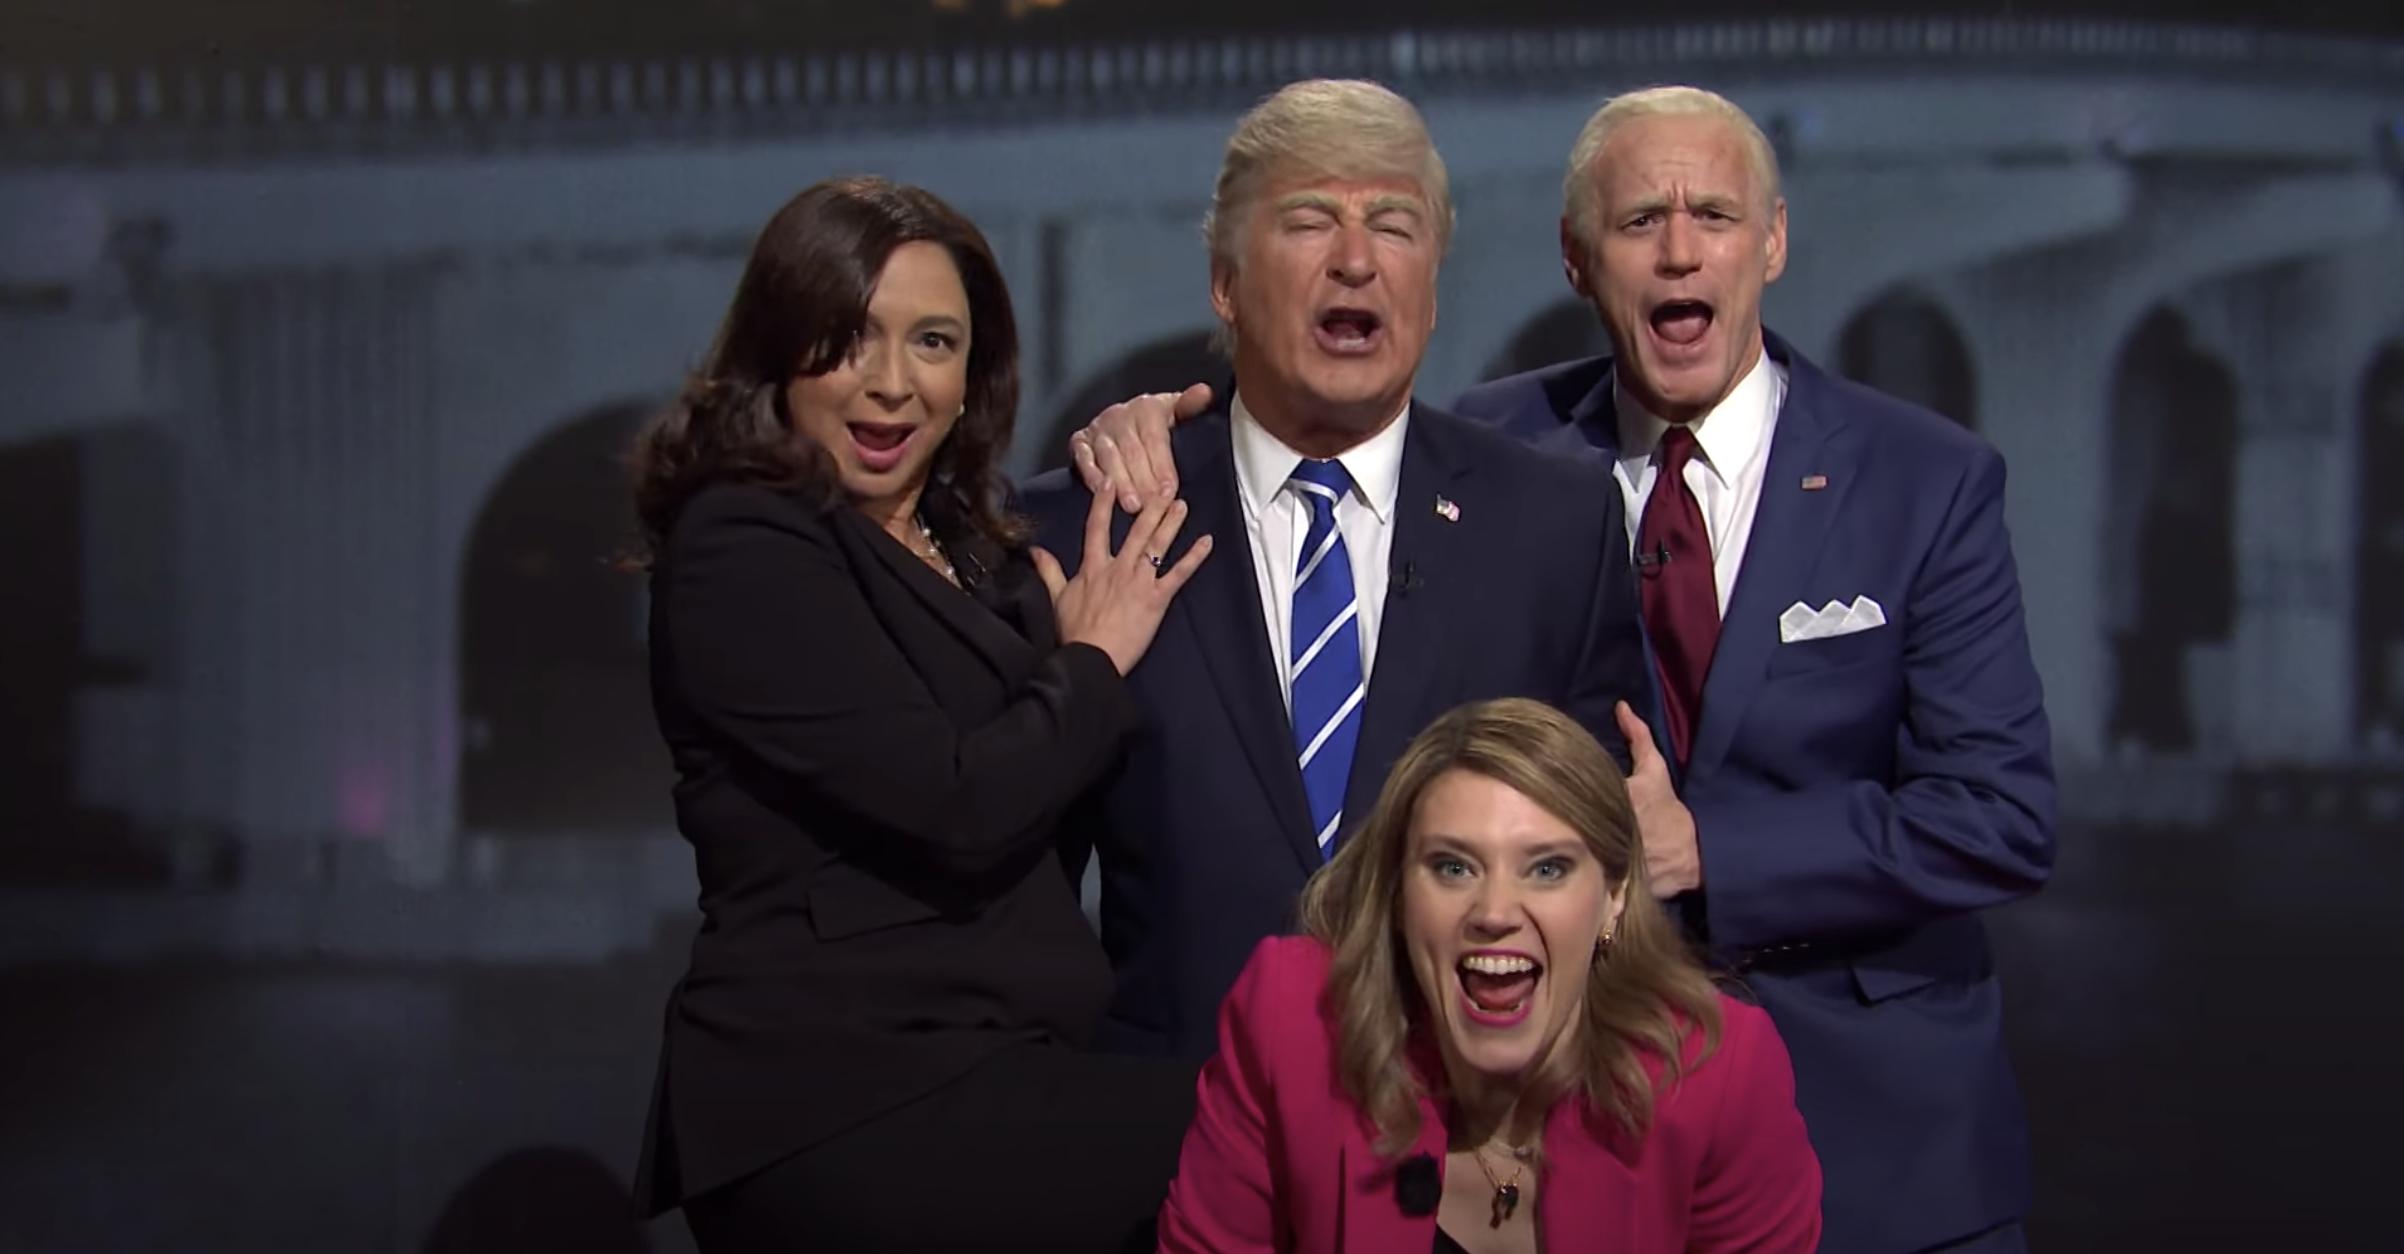 Harris, Trump, Biden, and Savannah